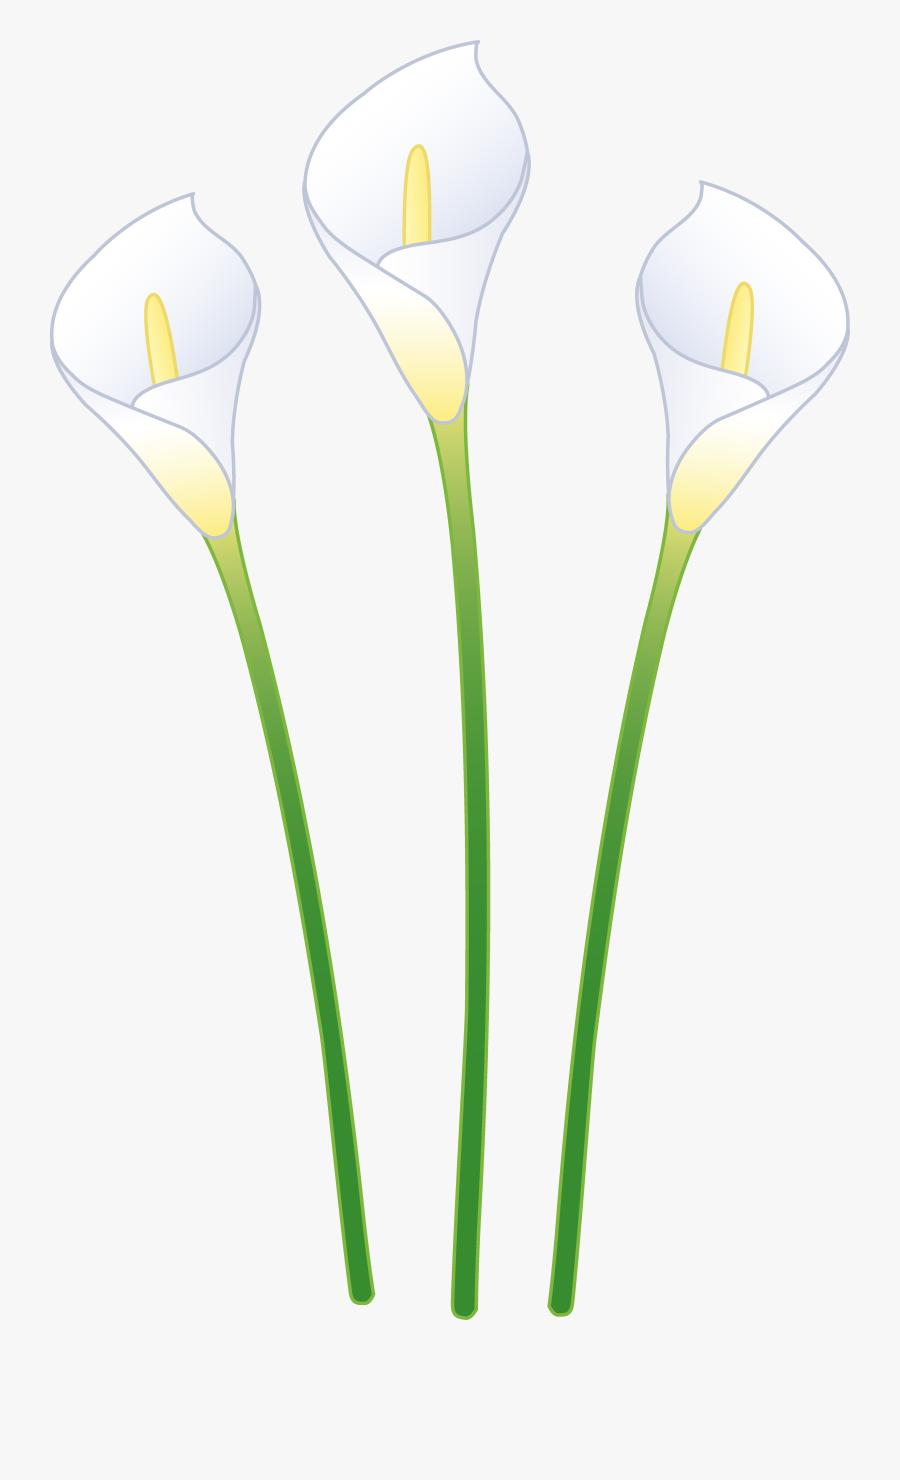 Three White Calla Lilies - Calla Lily Flowers Cartoon, Transparent Clipart